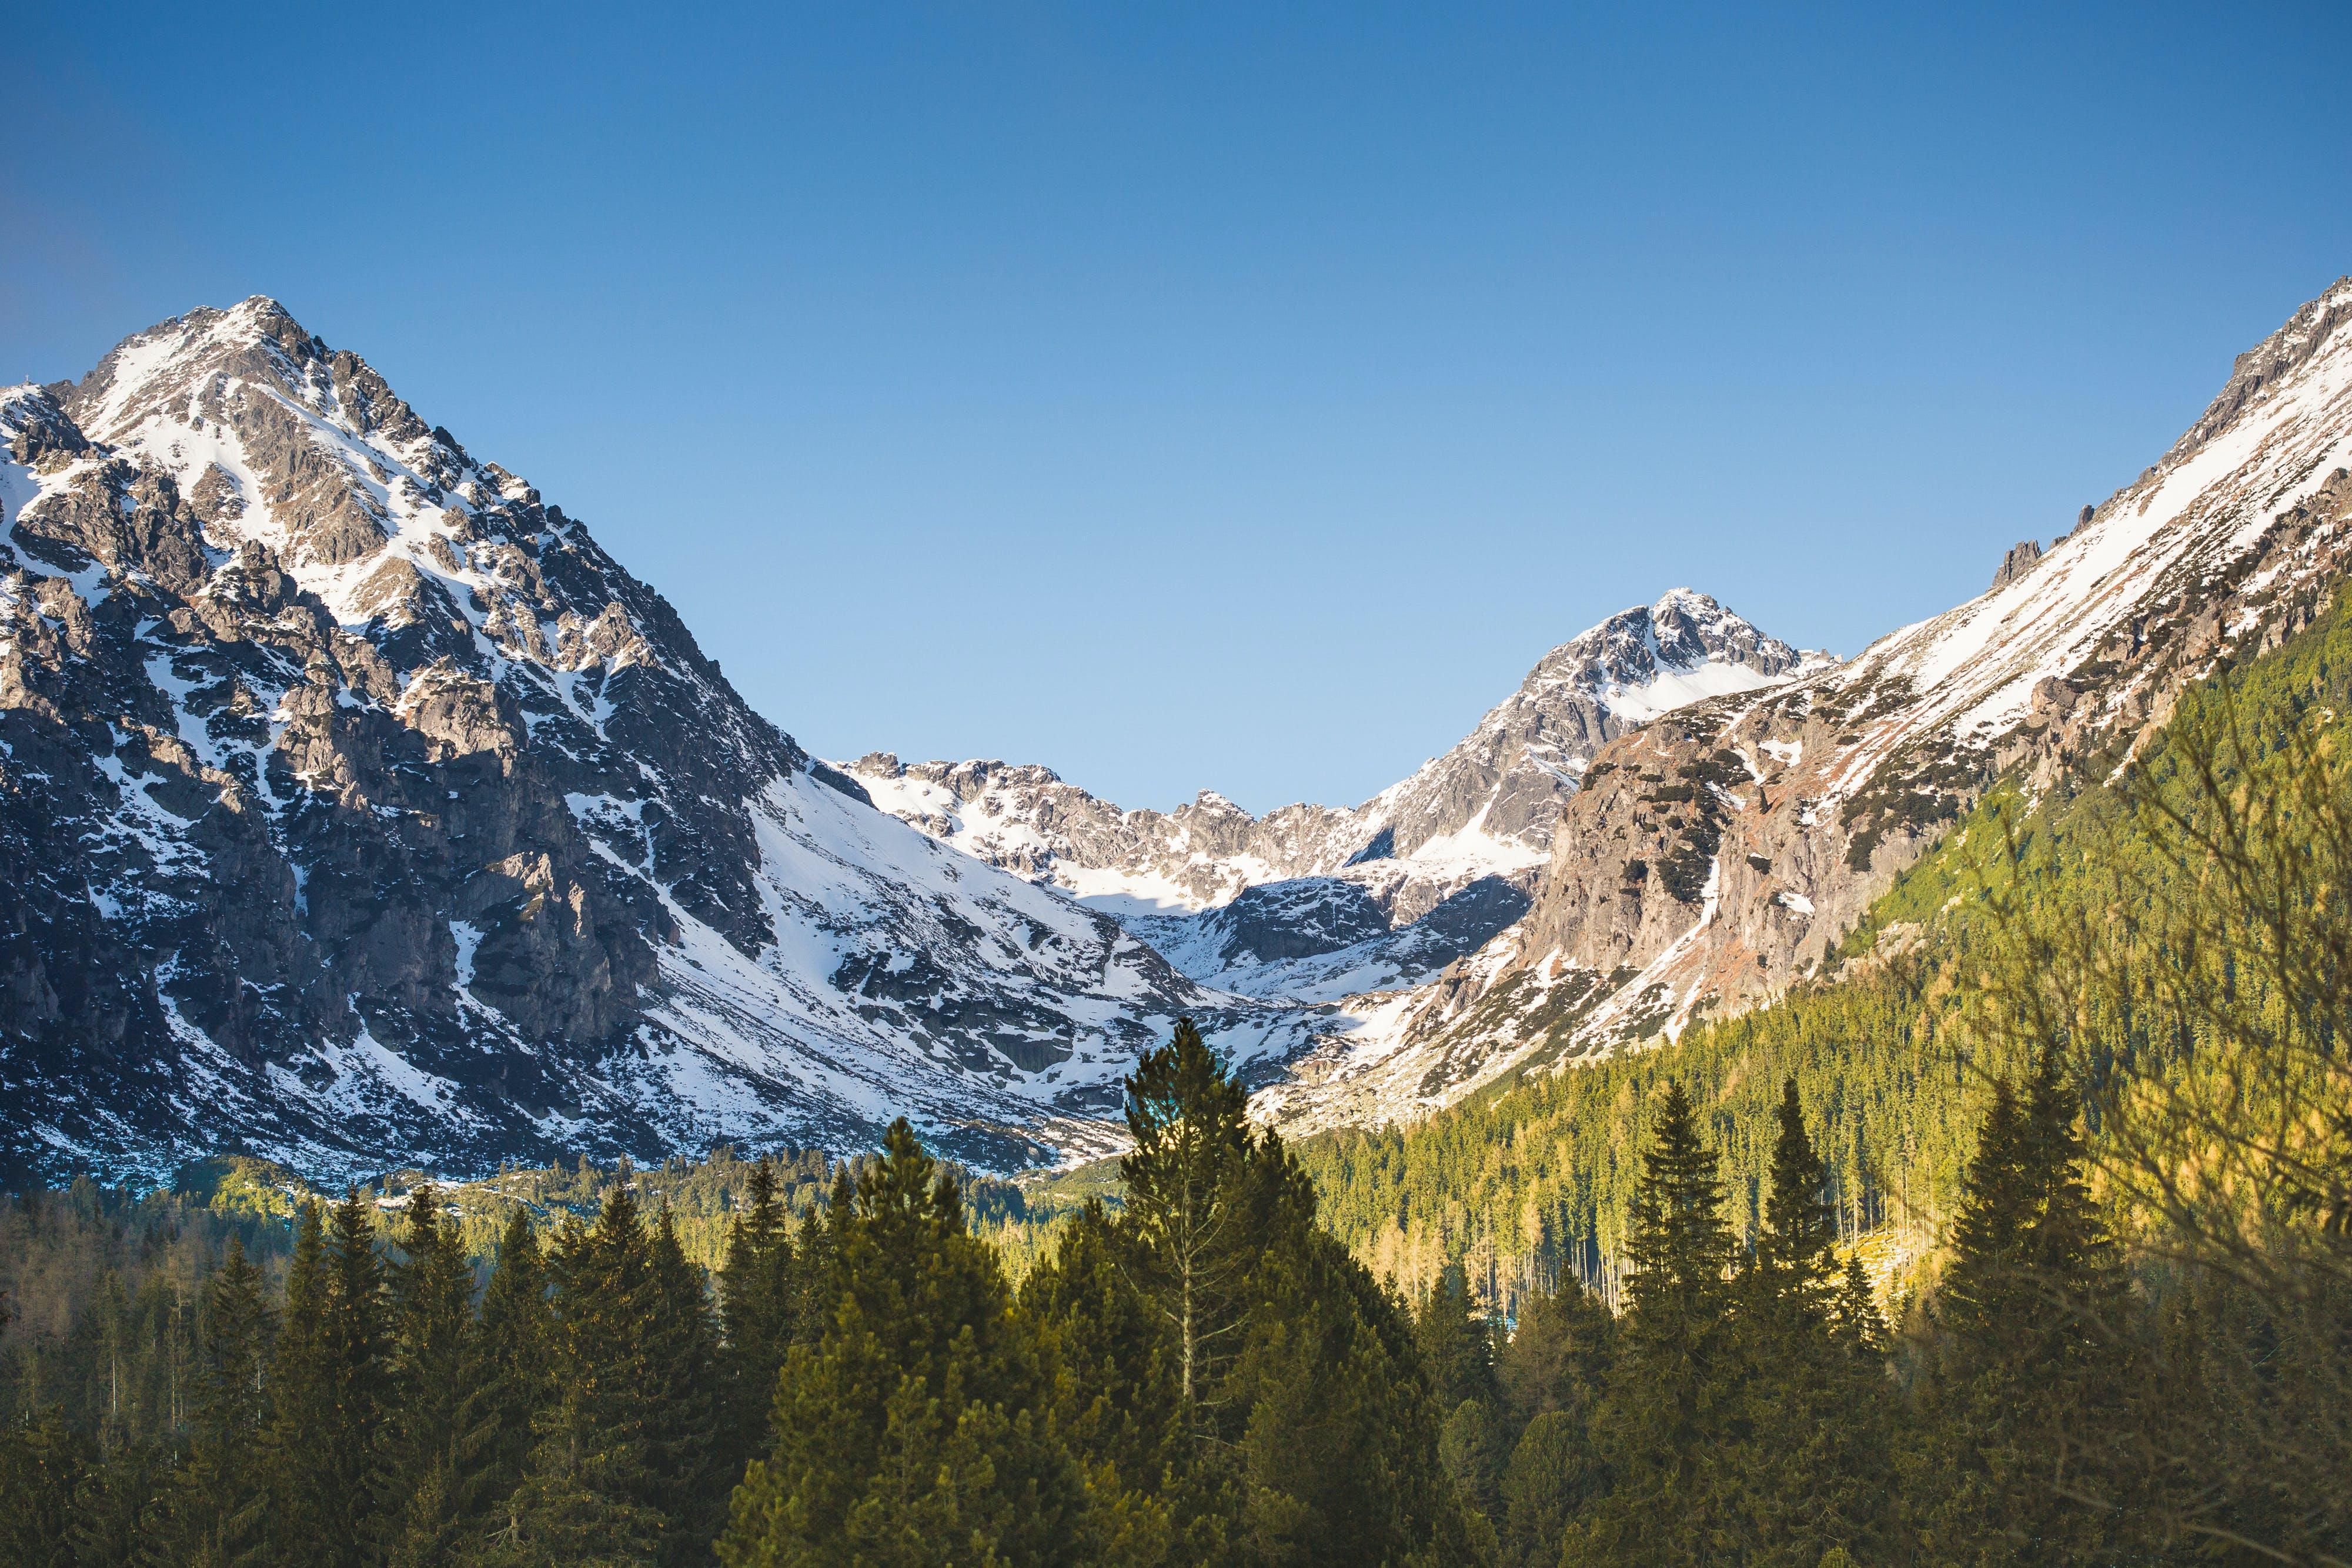 Kostnadsfri bild av bergen, bergstopp, dagsljus, dal